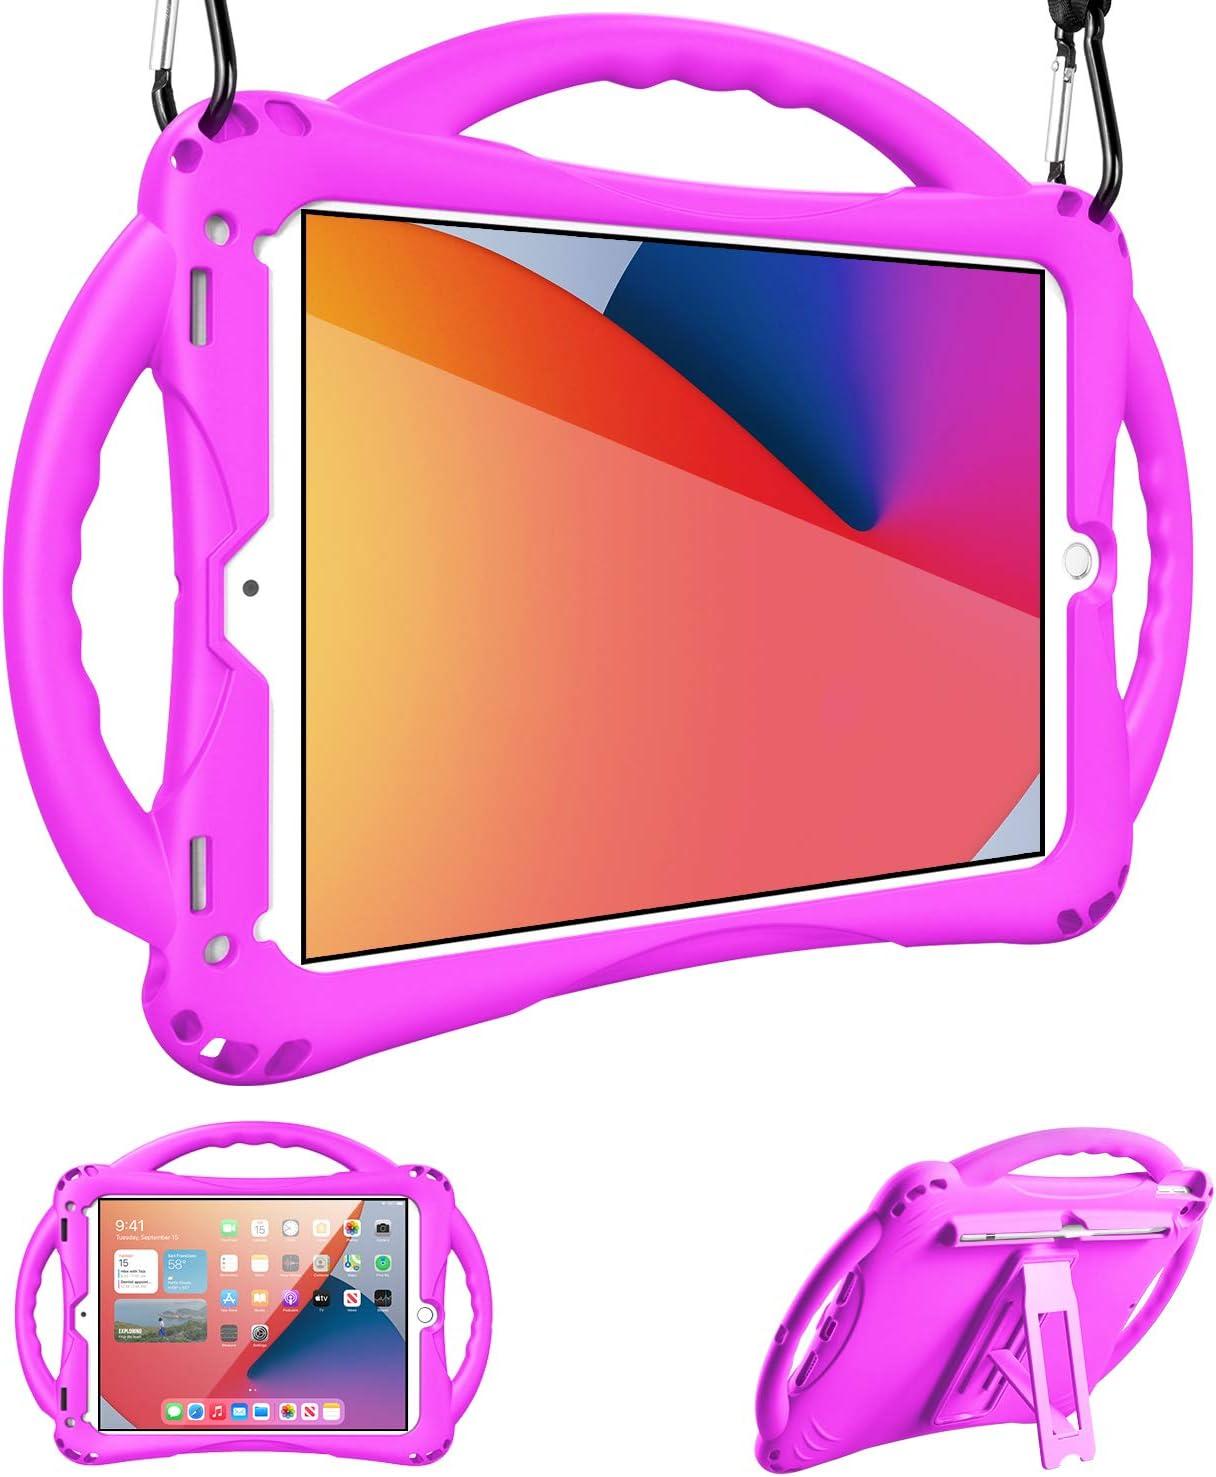 Adocham Kids case for iPad 8th & 7th Gen 10.2 (2020) iPad Air 3rd Gen 10.5 (2019)/ iPad Pro 10.5(2017), Premium Food-Grade Silicone Lightweight Shock Proof Handle Stand Kids Friendly Cover (Purple)